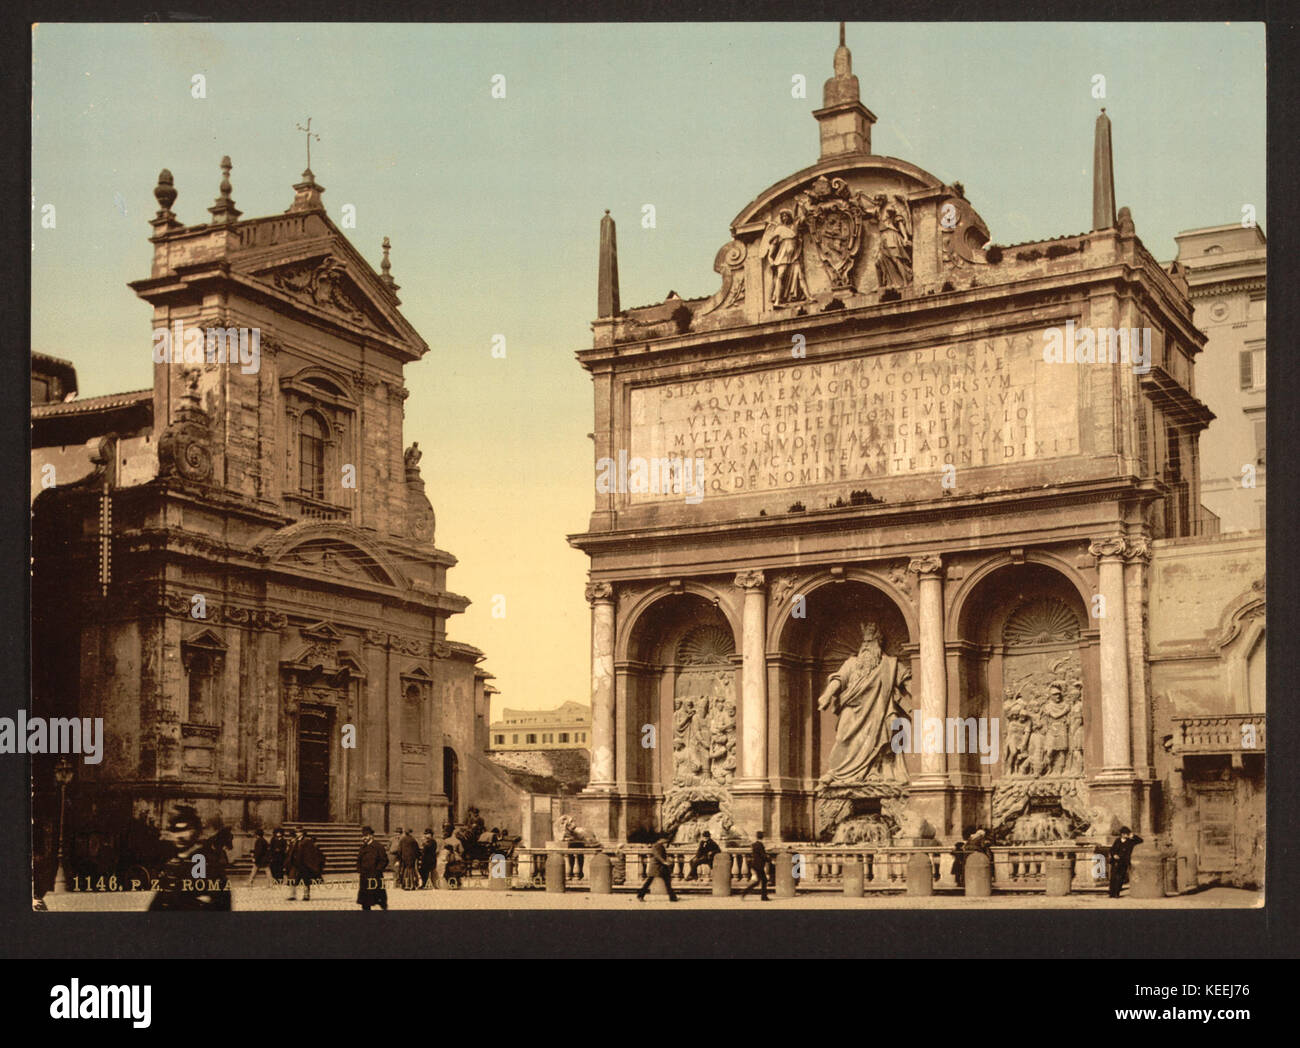 Fountain  Acqua Felice , Rome, Italy LCCN2001700947 - Stock Image